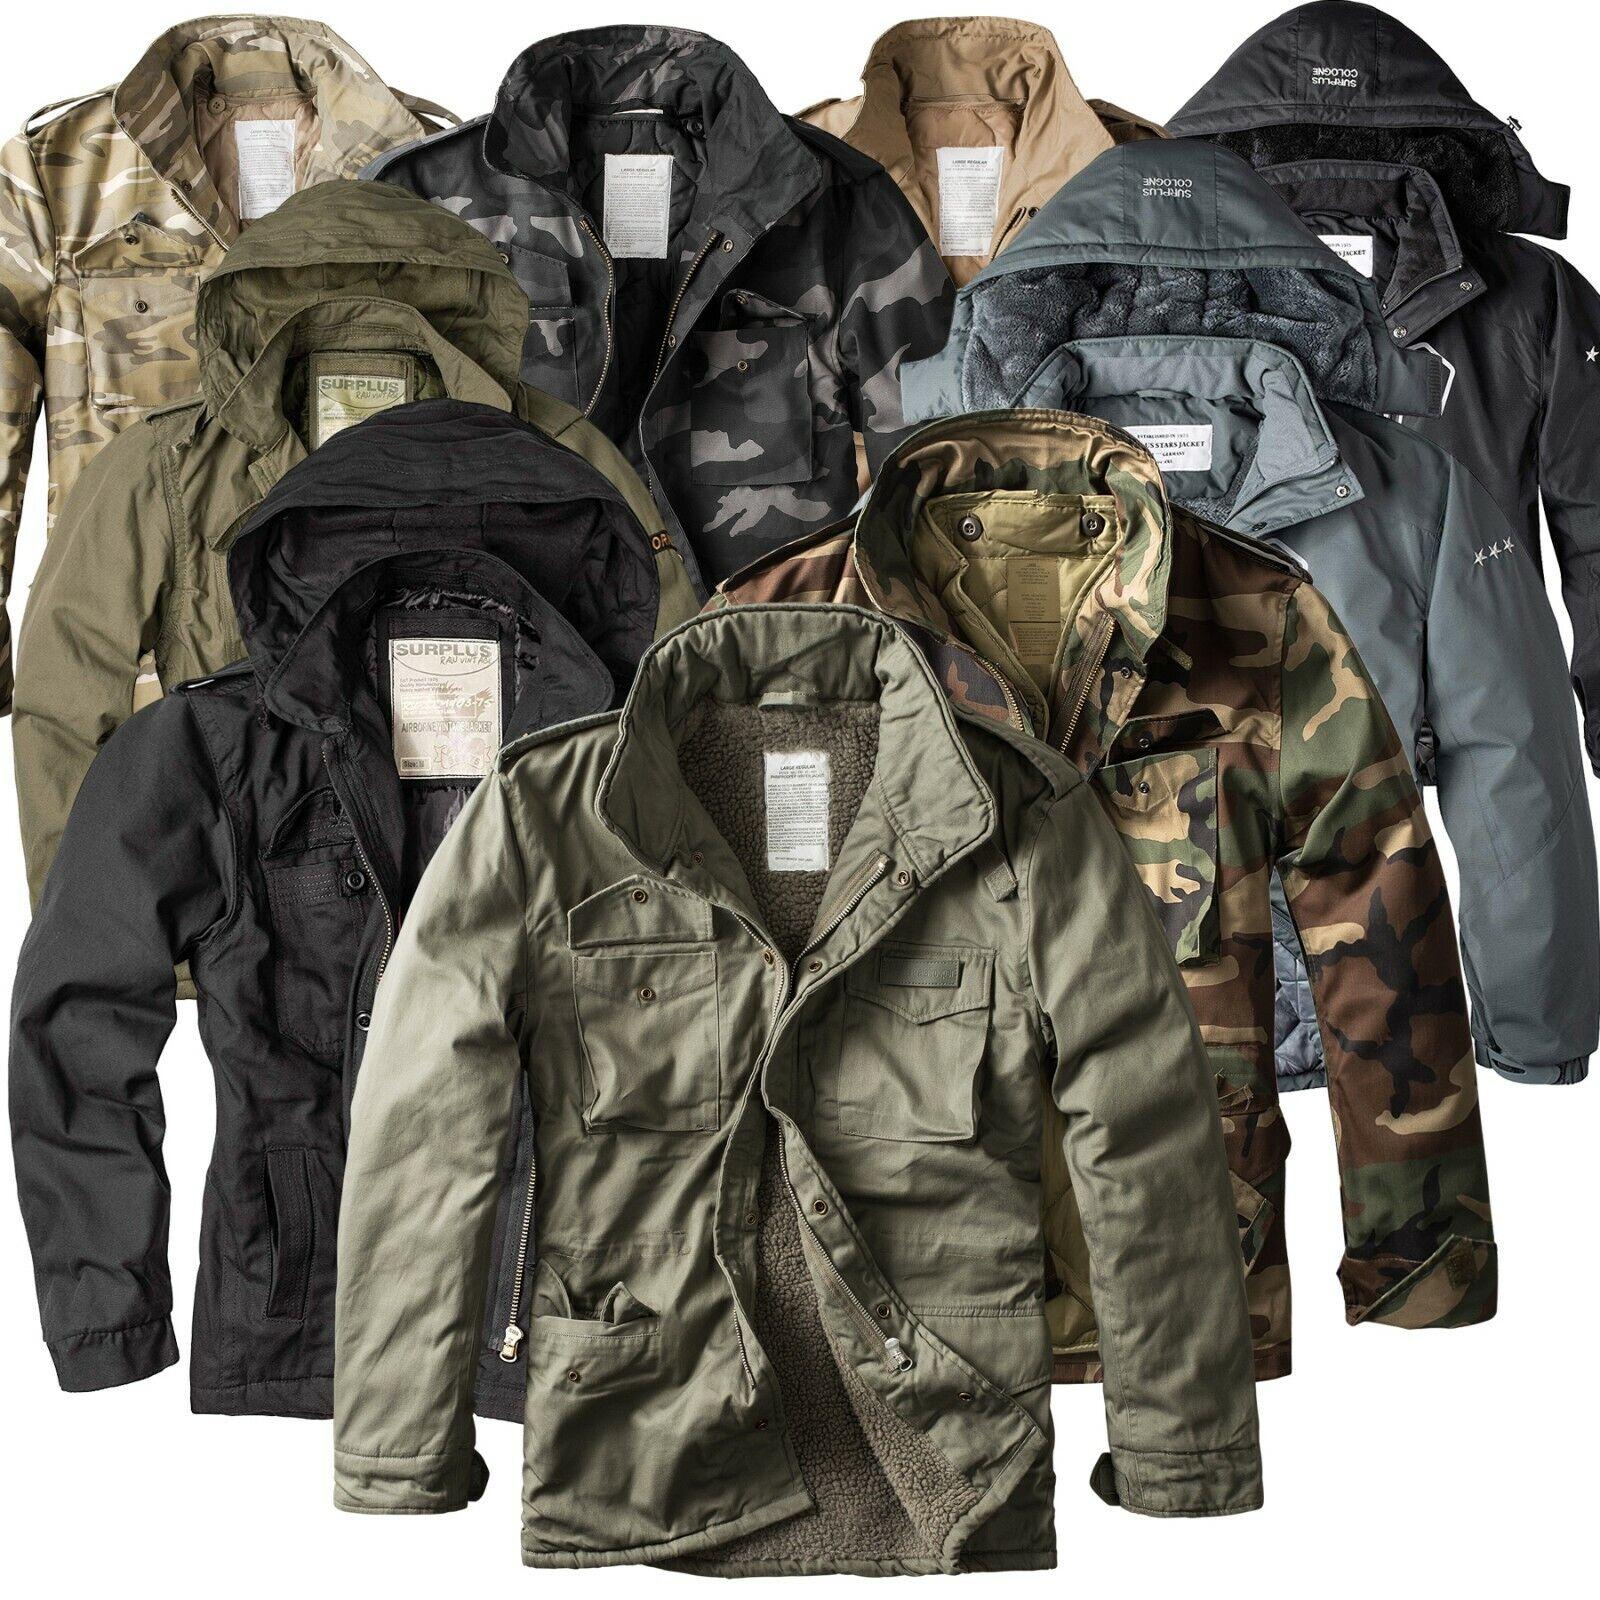 ★ SURPLUS RAW Vintage™ Herren Winter Jacken Fieldjackets Giant Parka 2019/2020